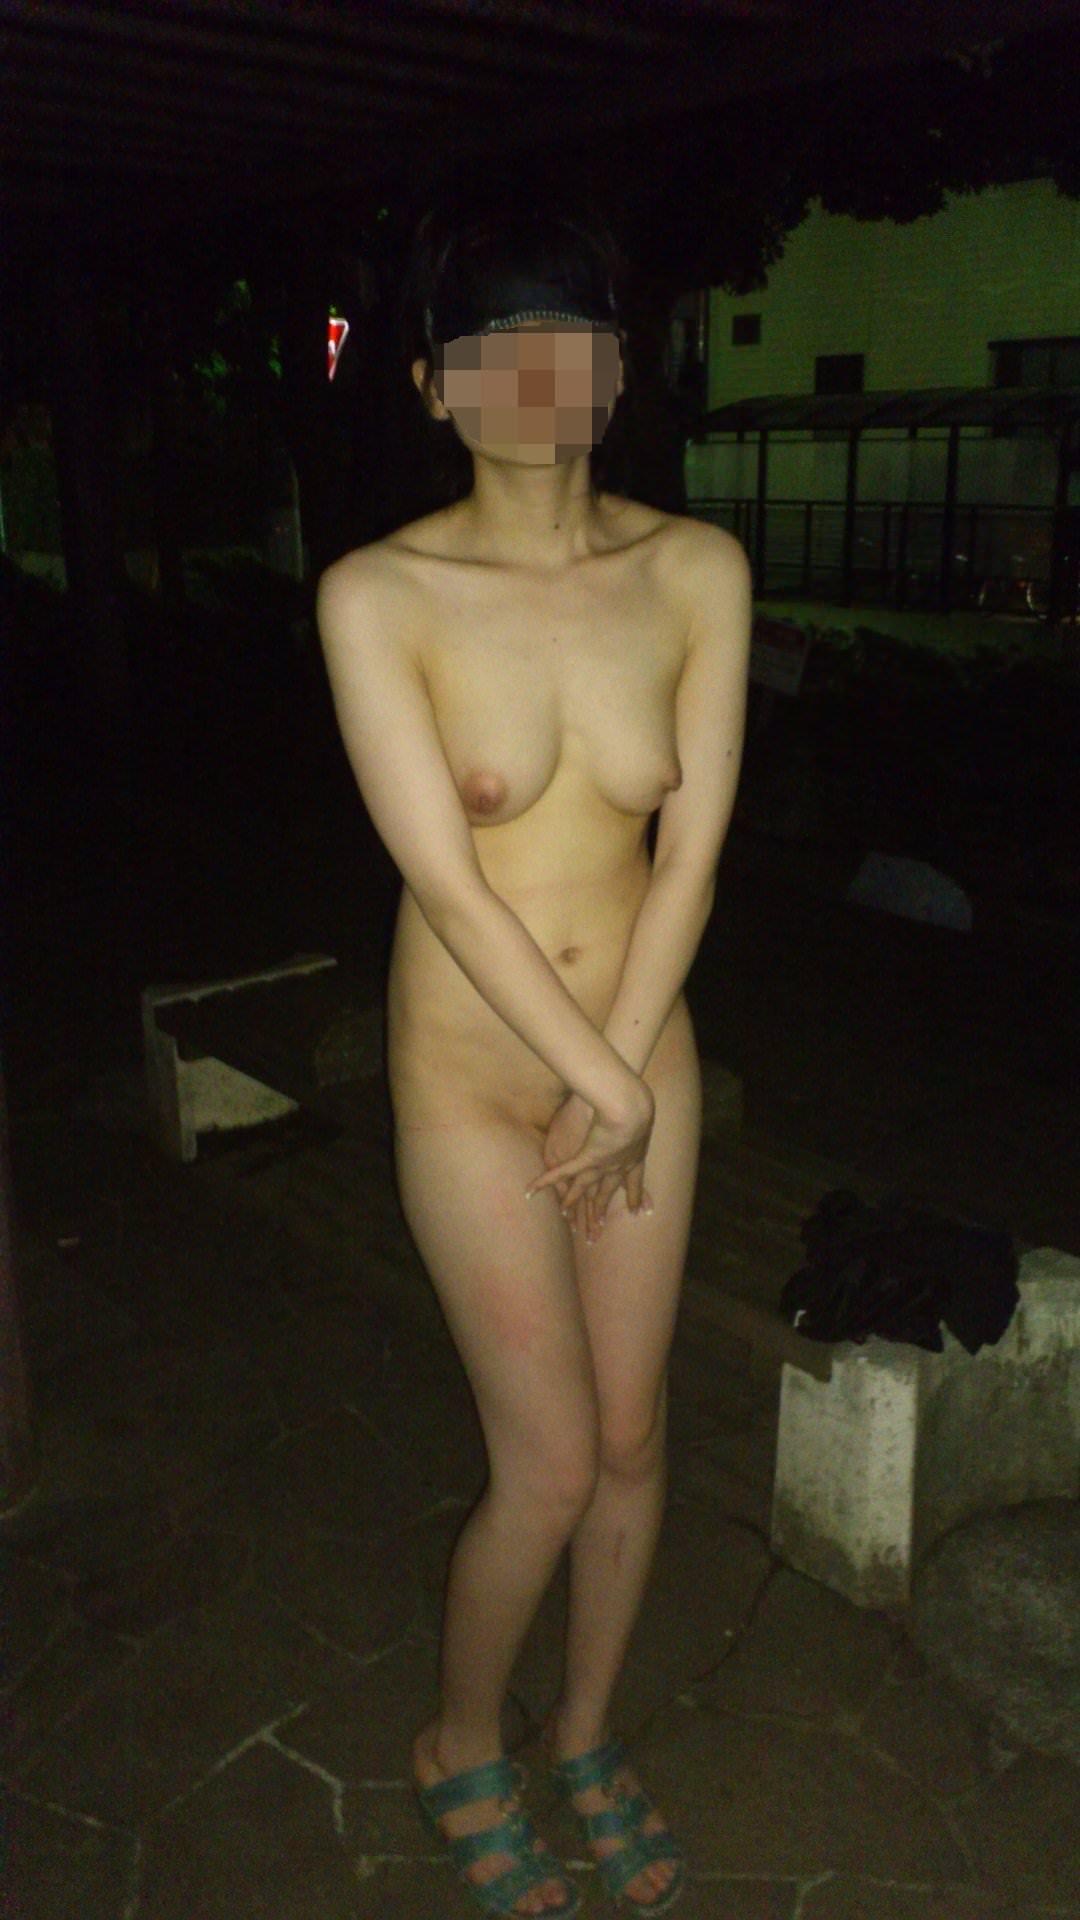 OLの彼女と夜中にいけない野外露出プレイした結果wwwww 1817